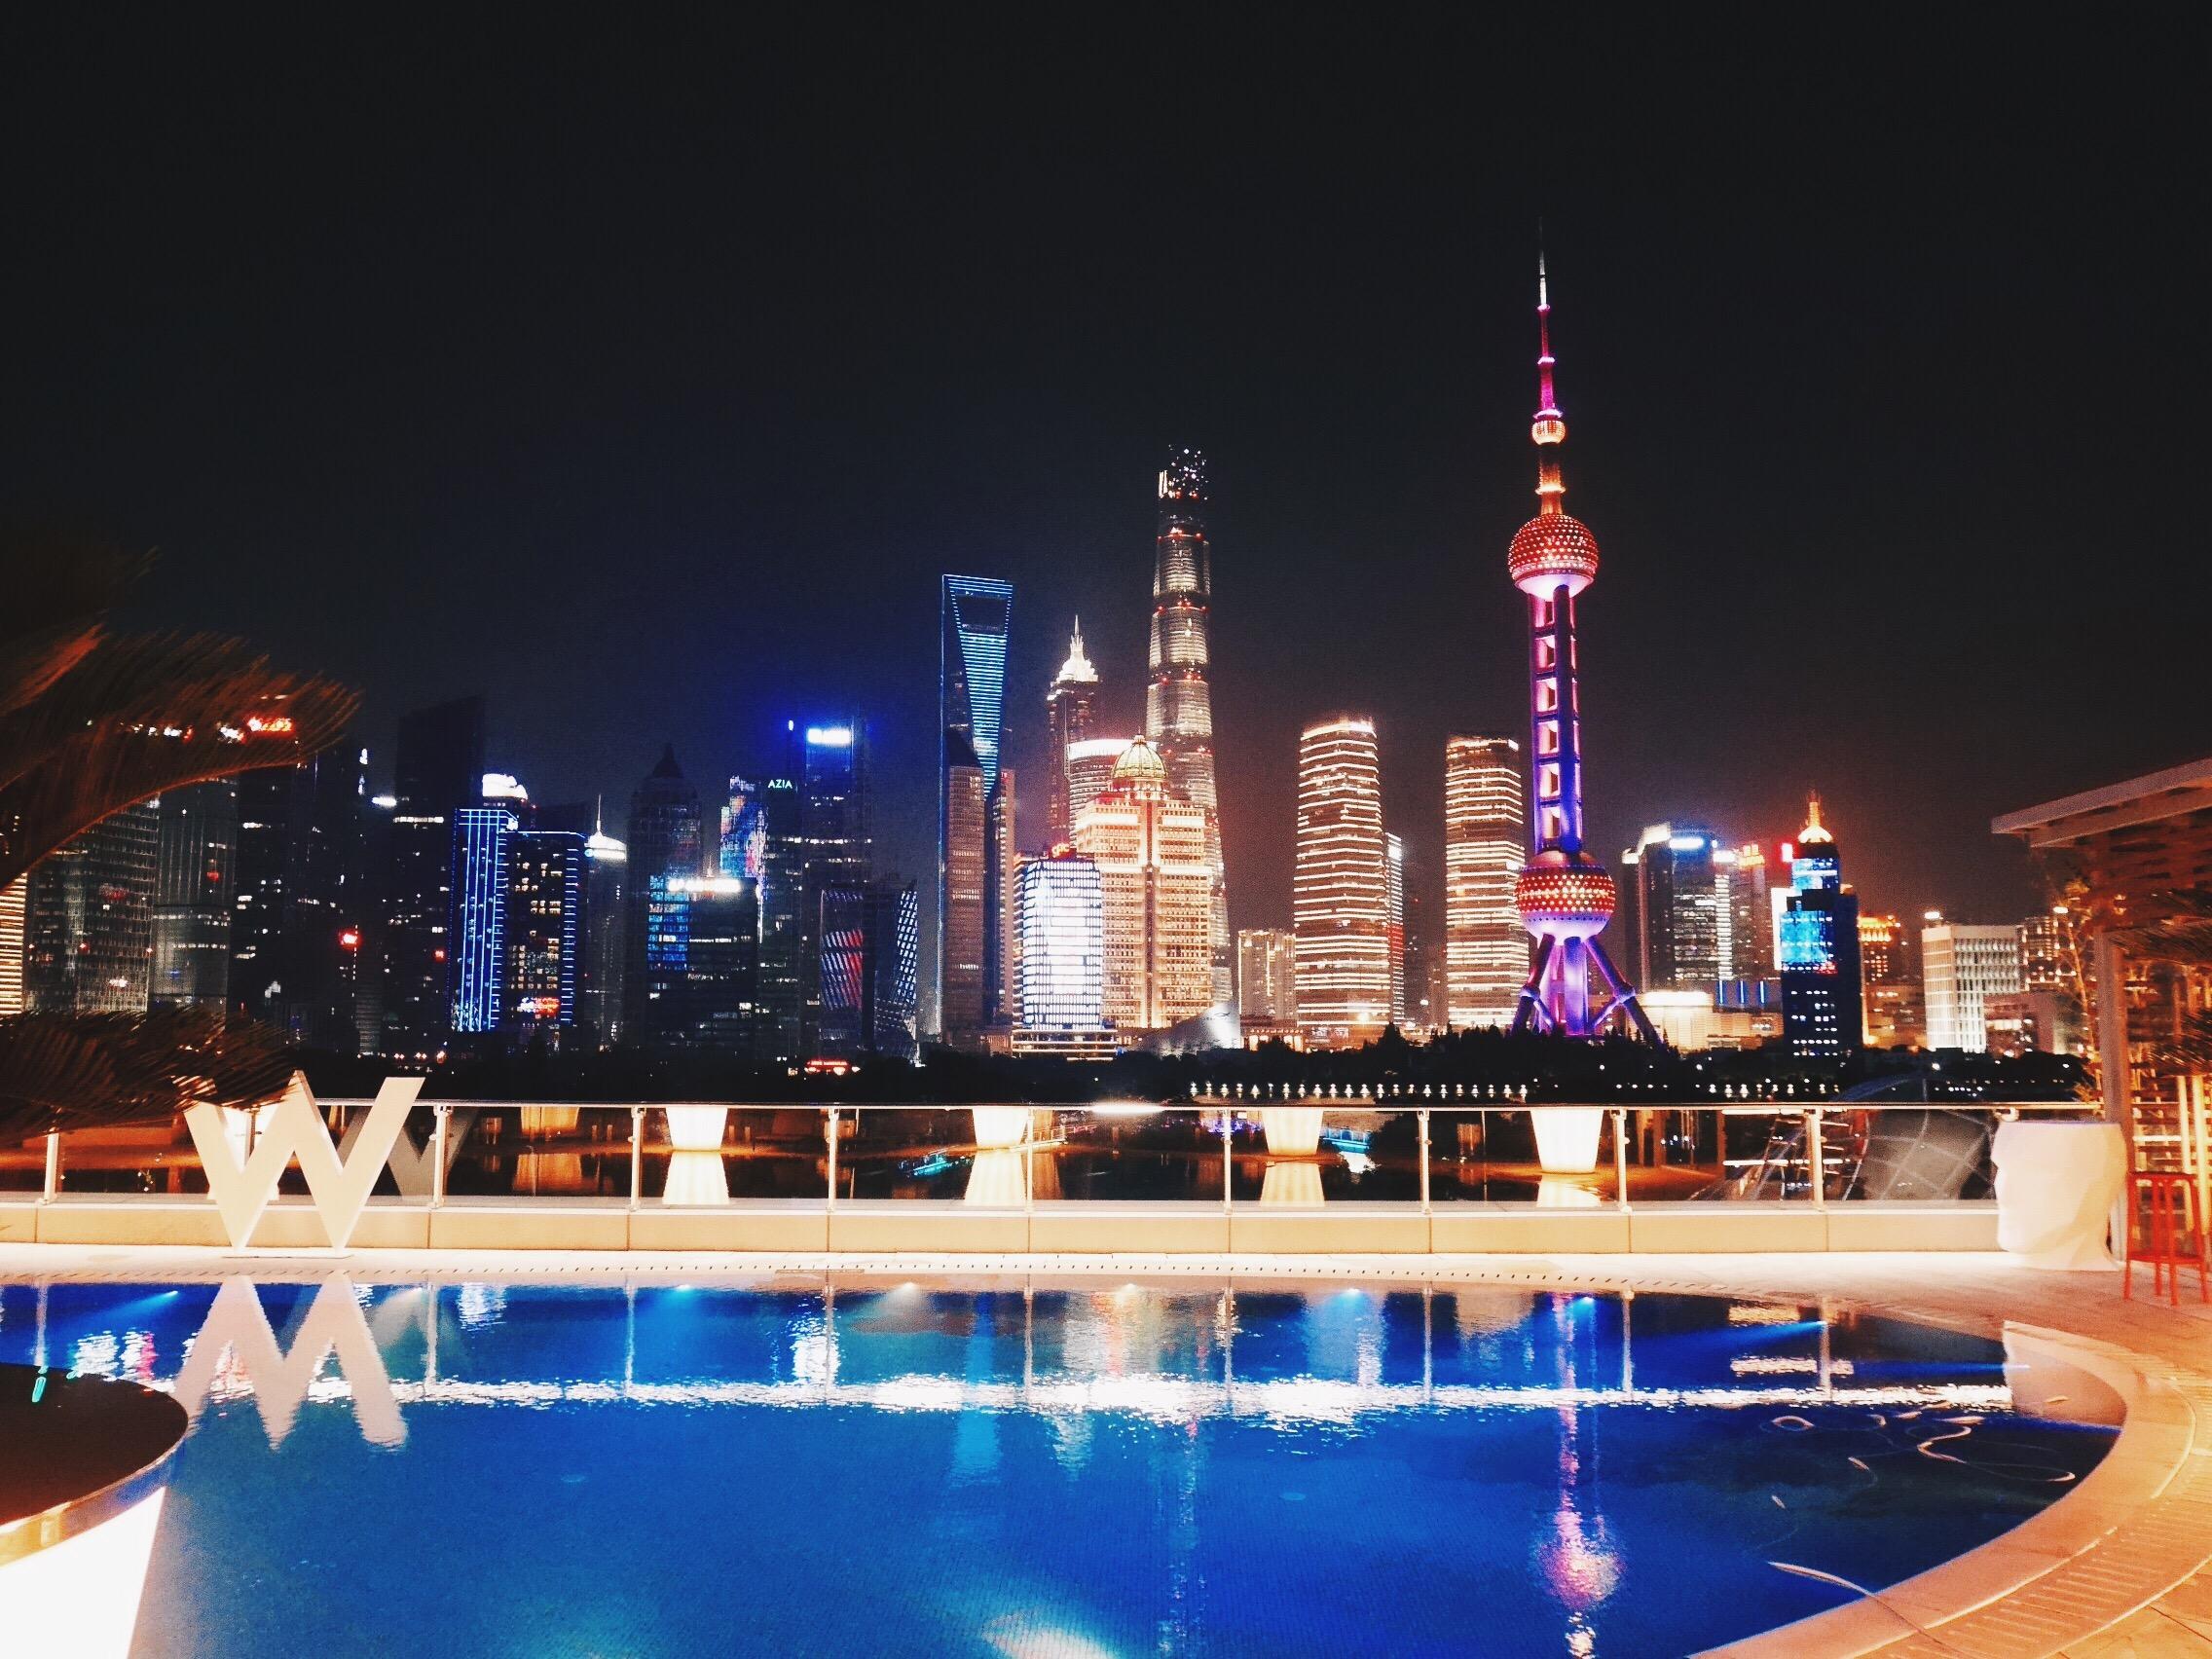 4d86a8c6 c4a1 493c 80ea cd106855b2ae - W HOTEL - 上海No.1の景色を楽しむホテル